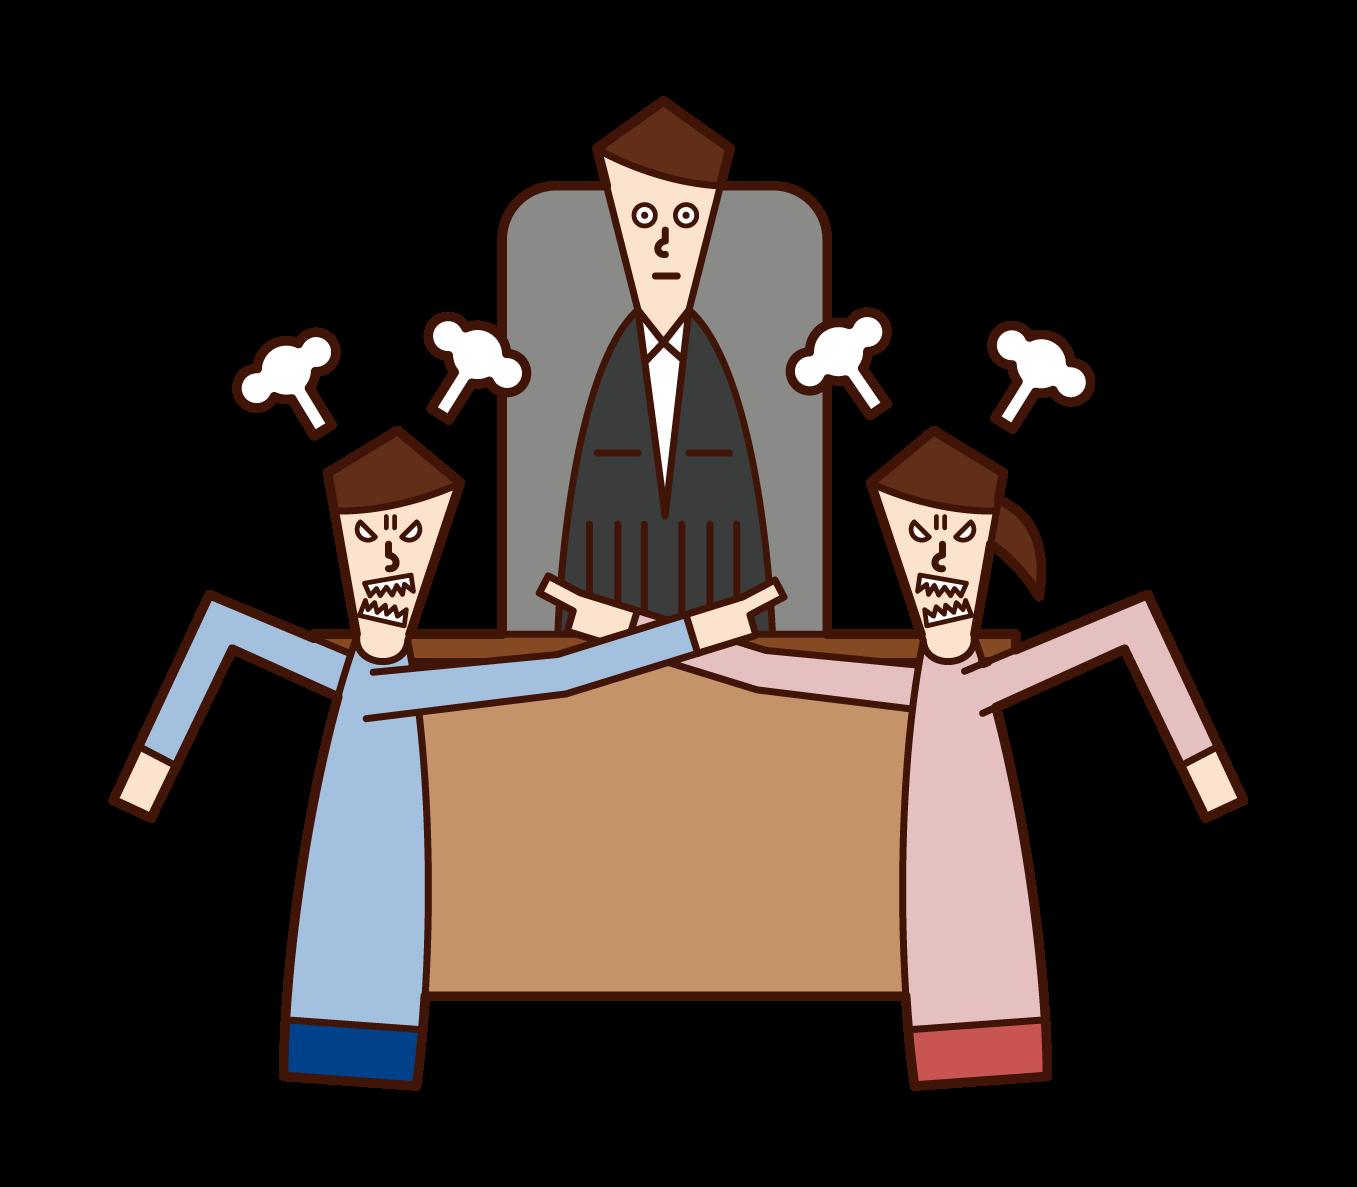 Illustration of divorce mediation and trial